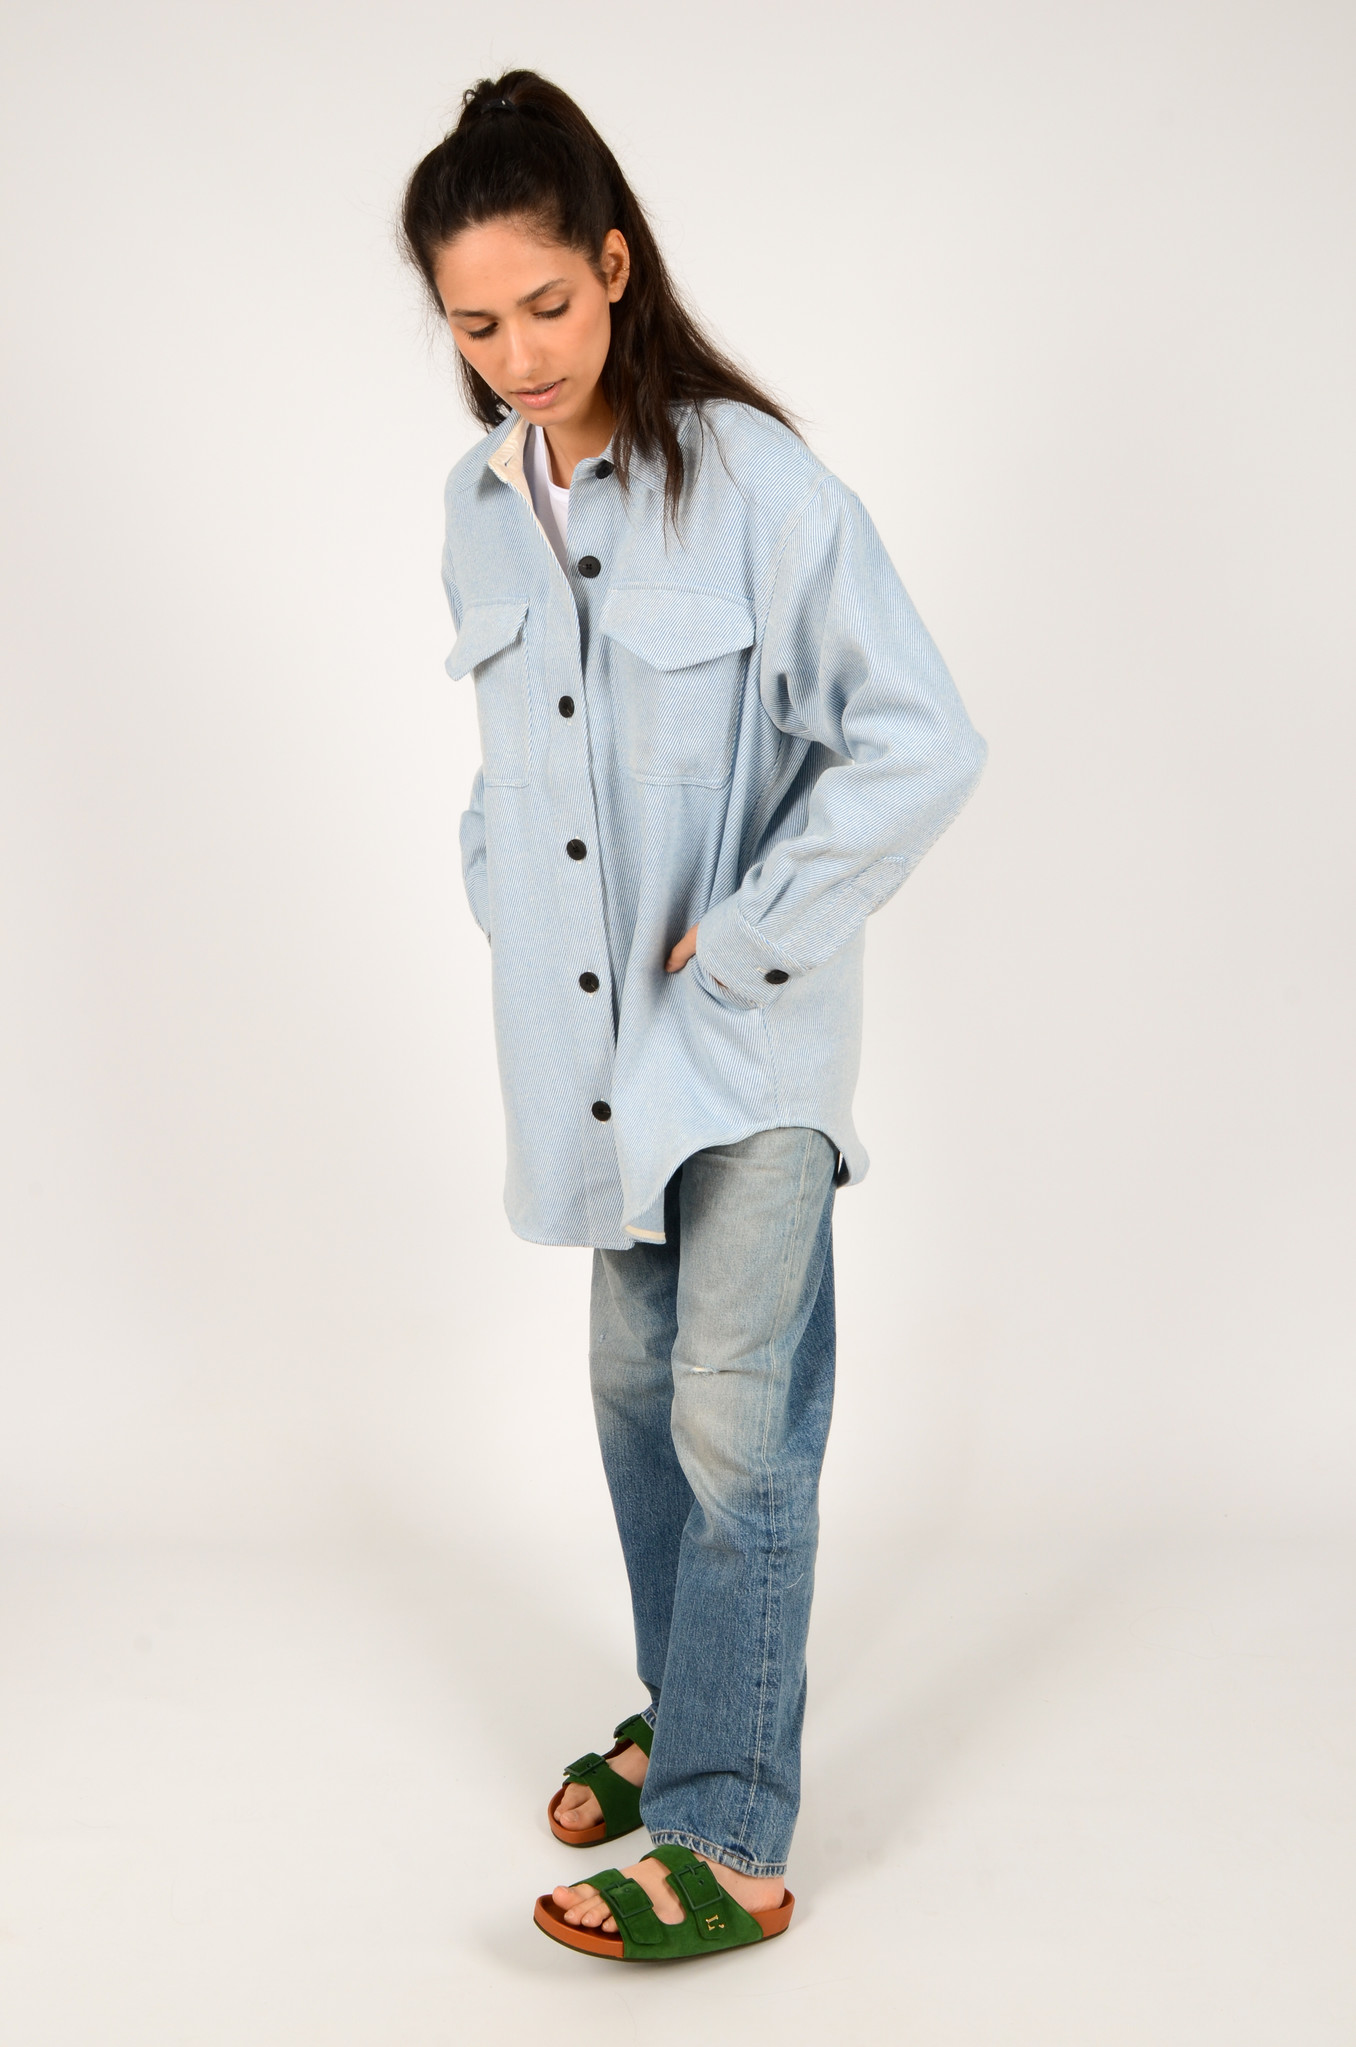 PALERMO SHIRT COAT IN DUSTY BLUE-6